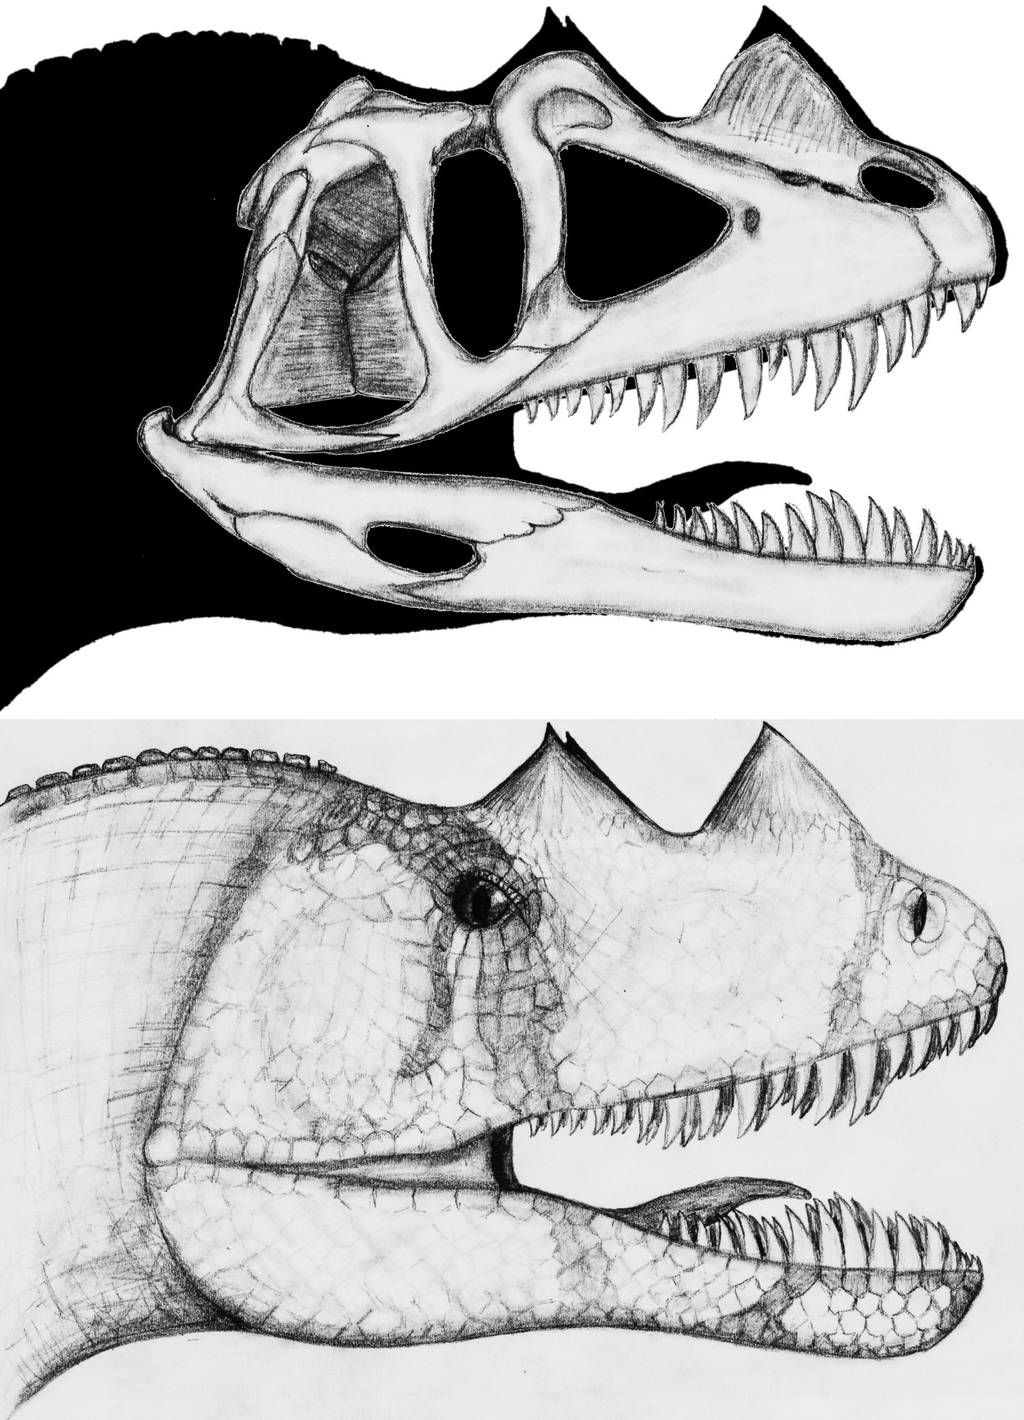 Ceratosaurus nasicornis by theropod1